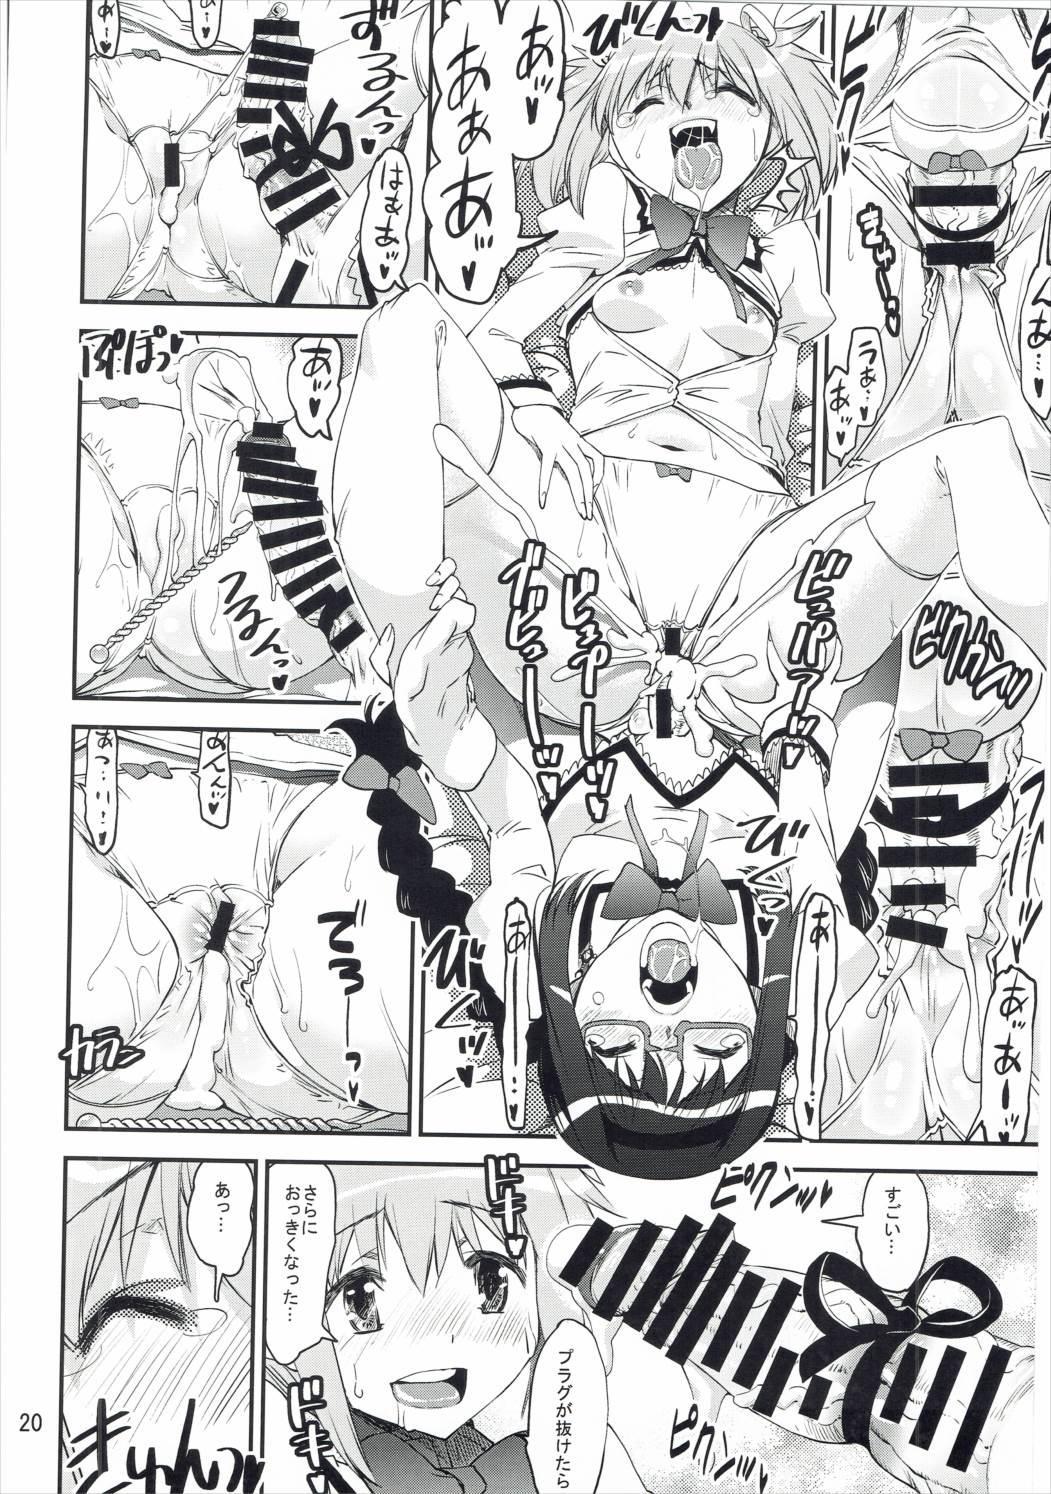 (C89) [KATAMARI-YA (Kanetsuki Masayoshi, Shinama) Noushuku! ! Homumilk (Puella Magi Madoka Magica) 18